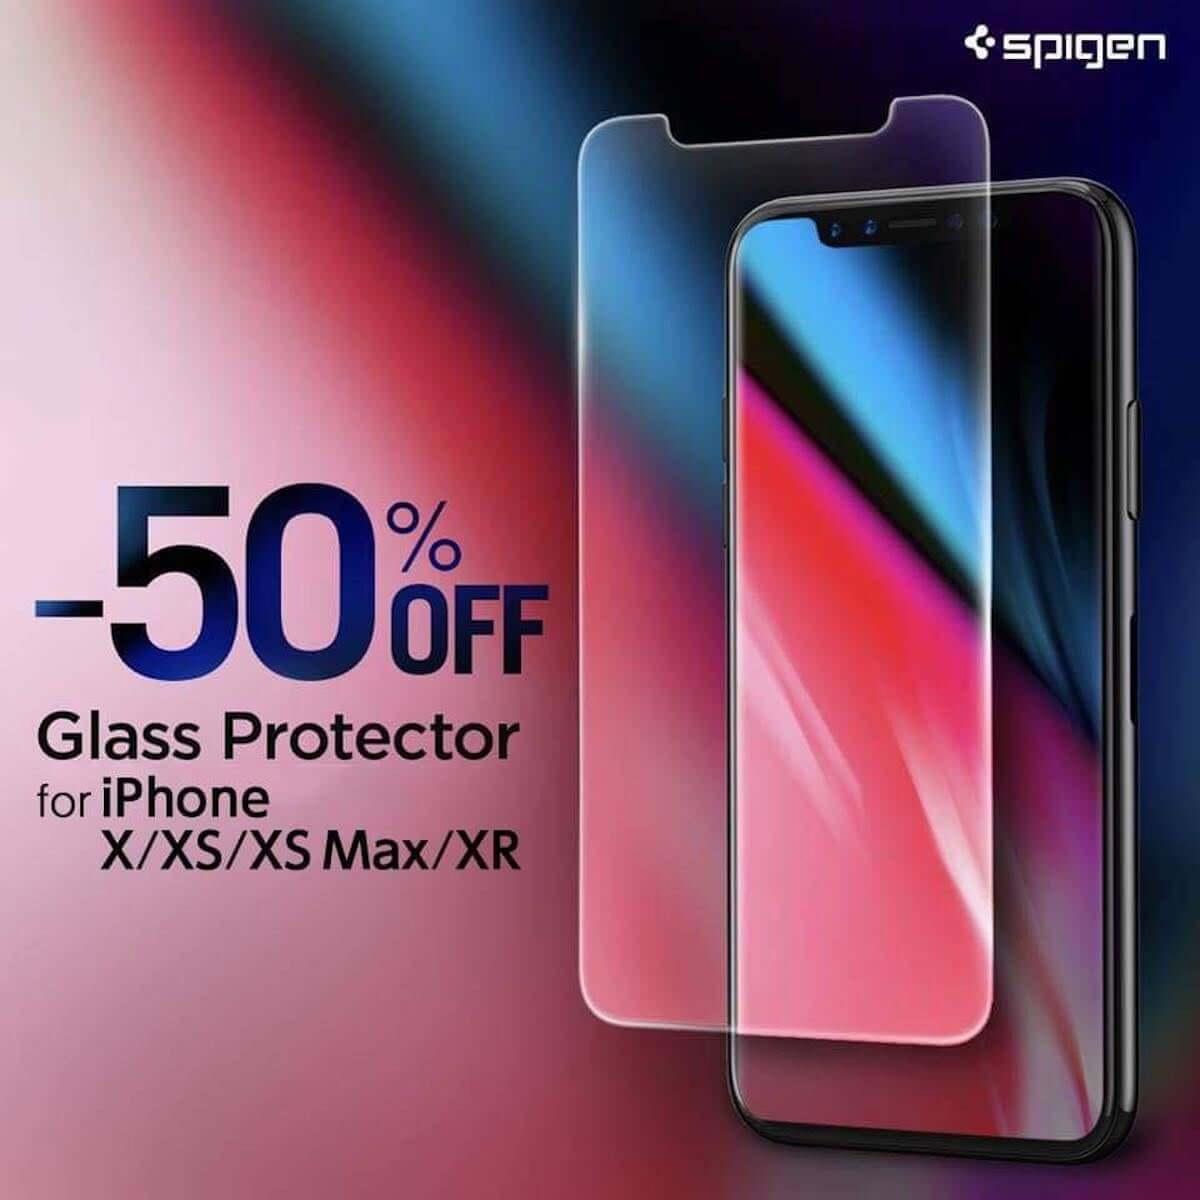 iPhone XR発売記念!Spigenの硬度9H、薄さ0.4mmガラスフィルムが期間限定で半額! technology181026_spigen_1-1200x1200